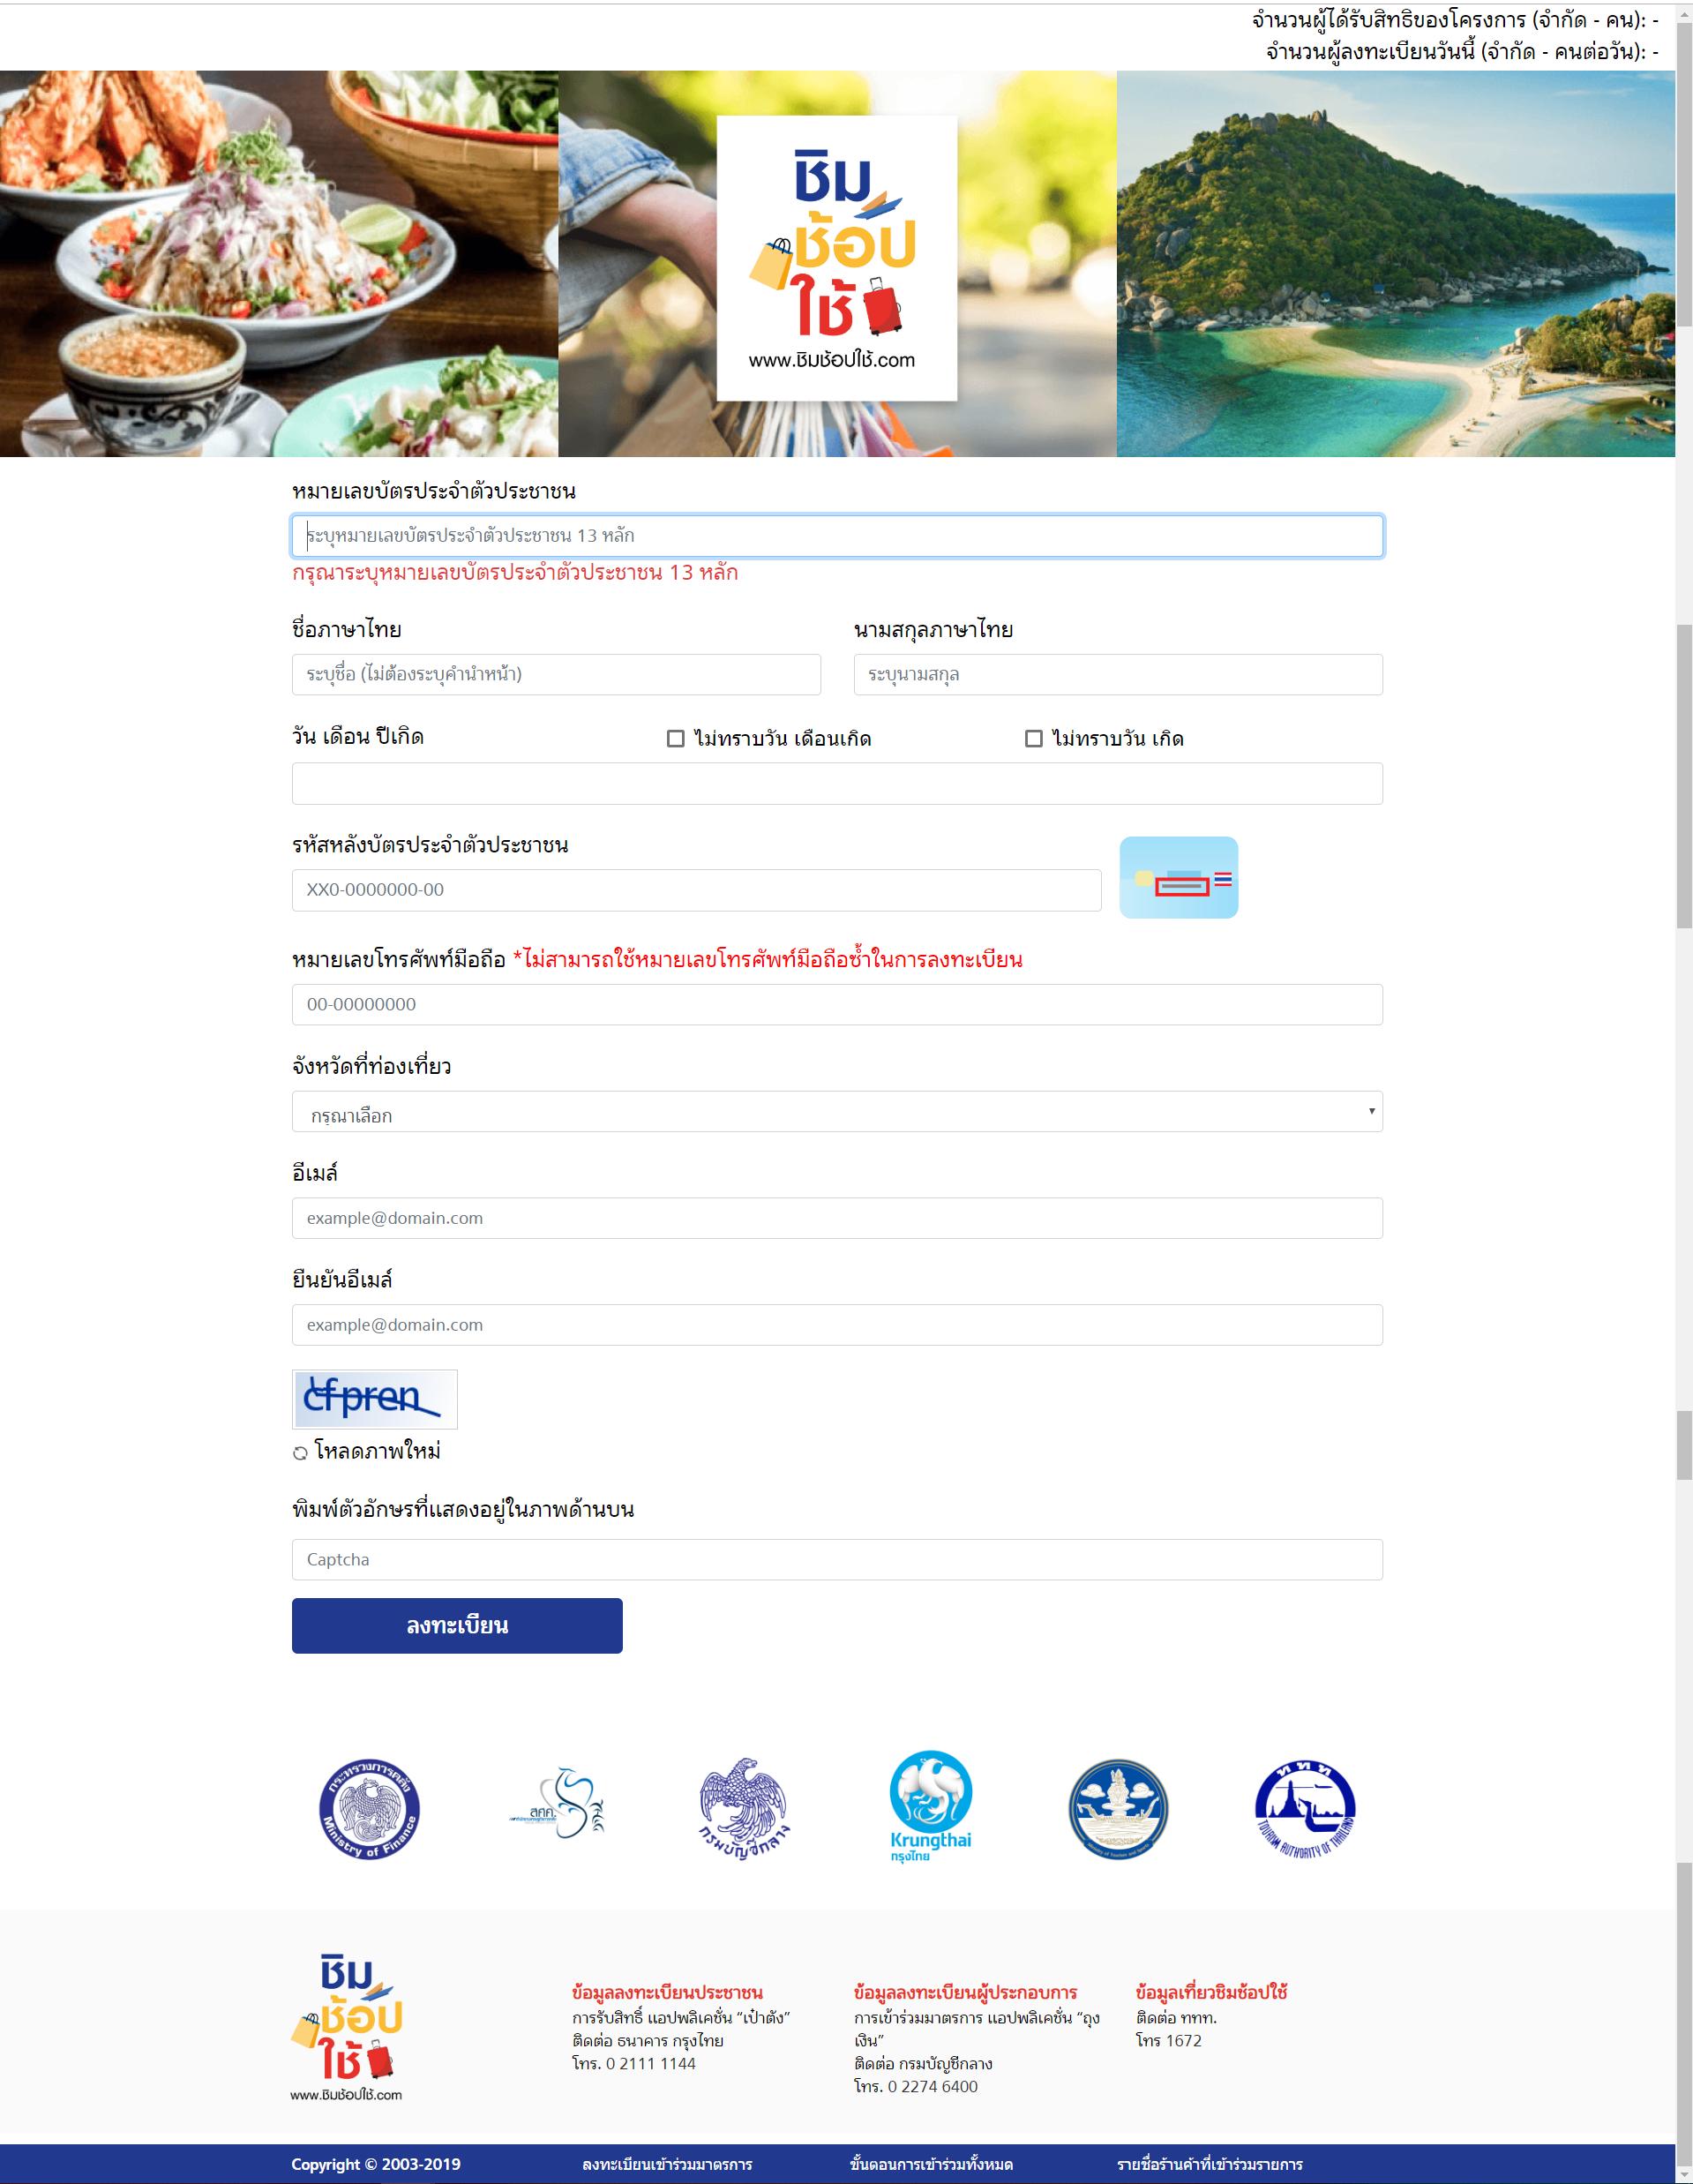 register-government-1000-baht รายชื่อร้านค้า